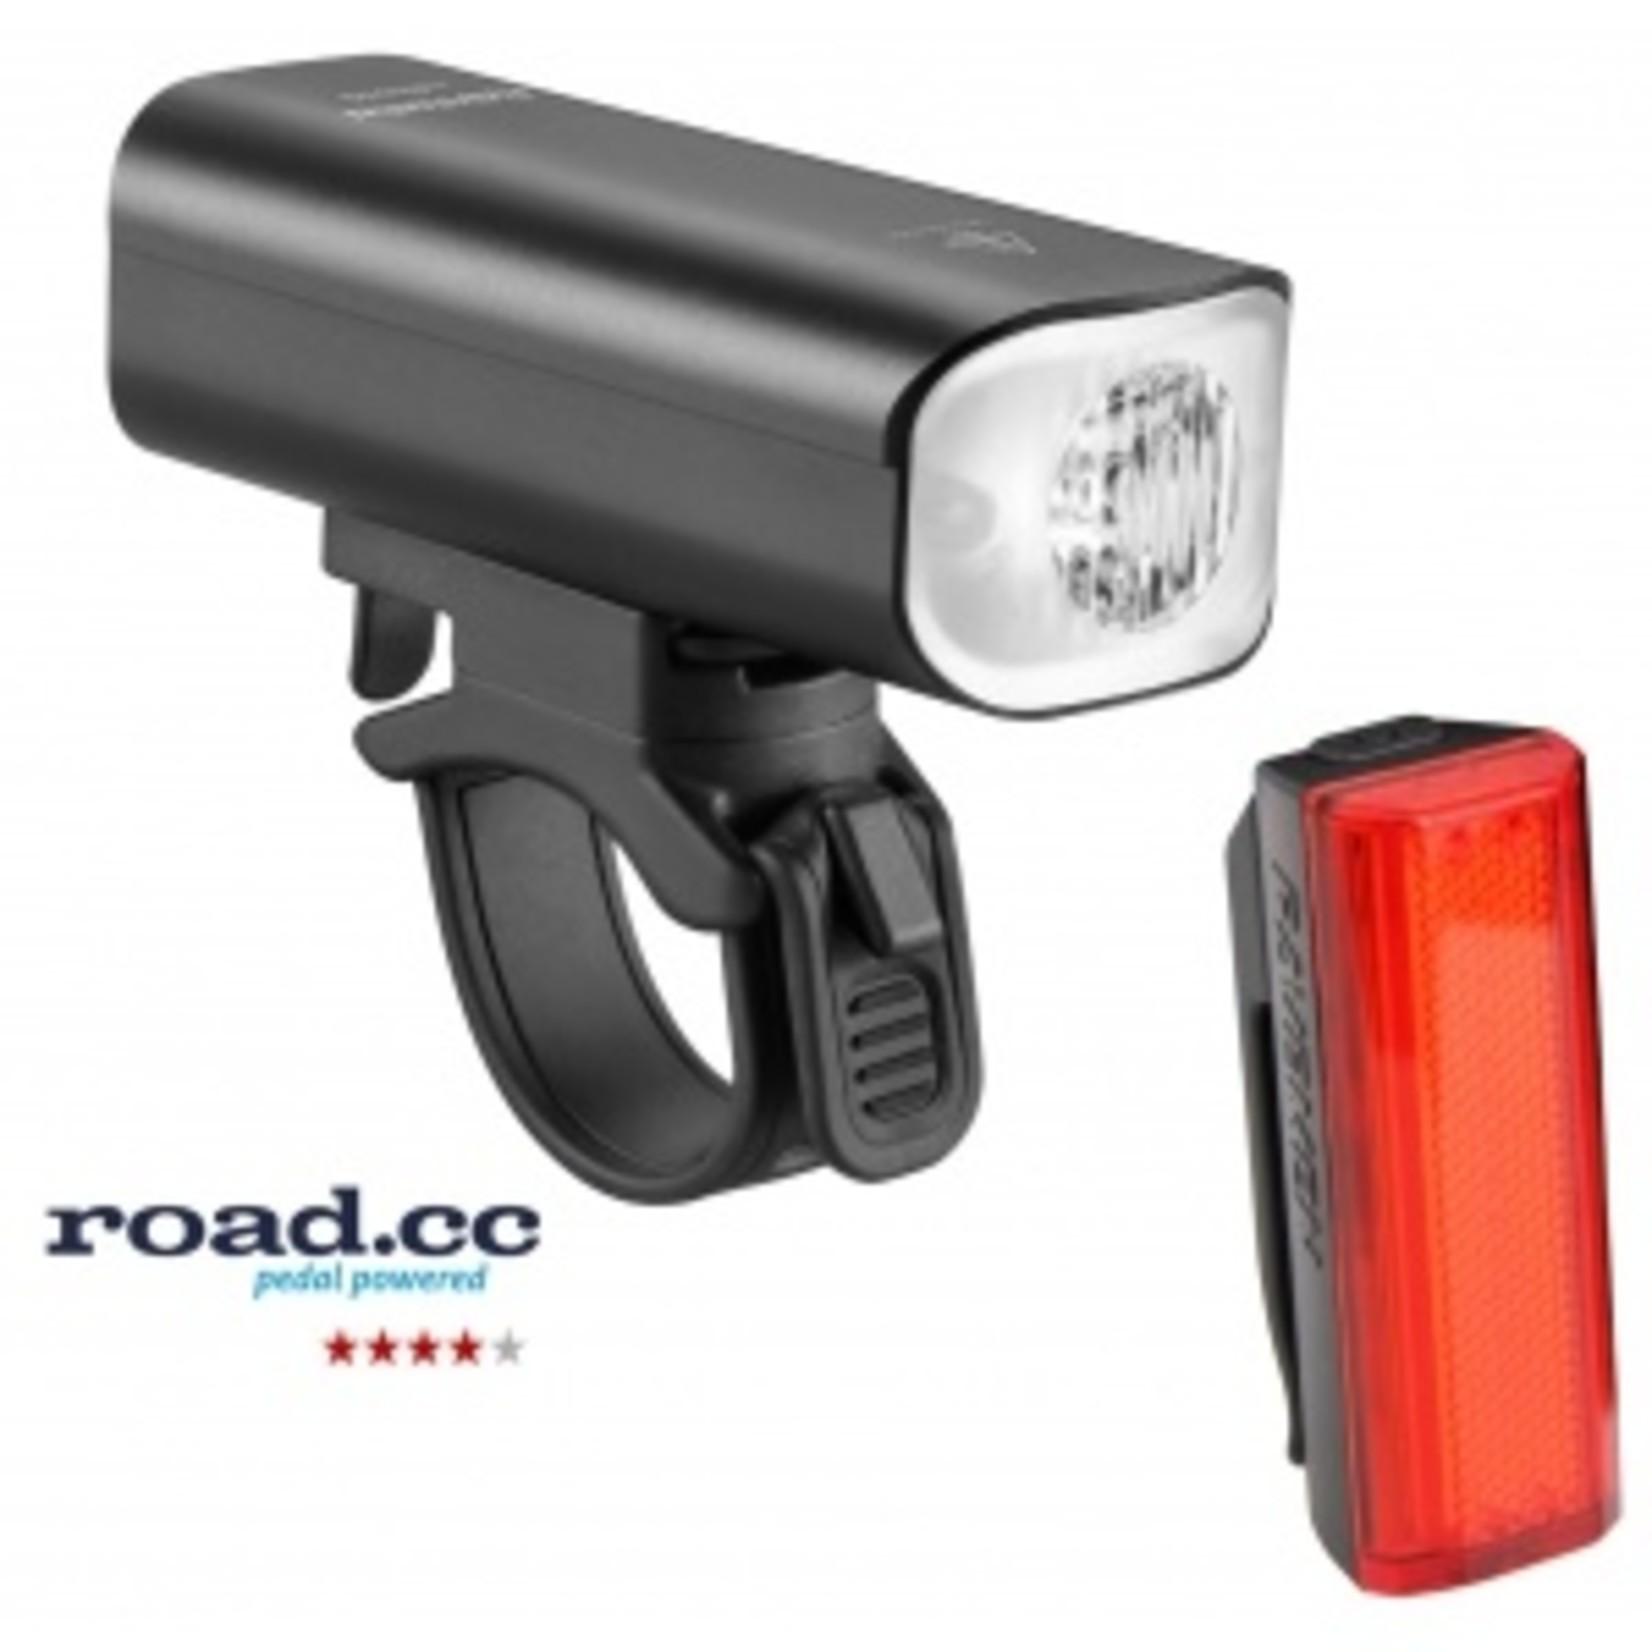 Raveman Ravemen LR500S (500 Lumens) / TR20 (20 Lumens) USB Rechargeable Twinset